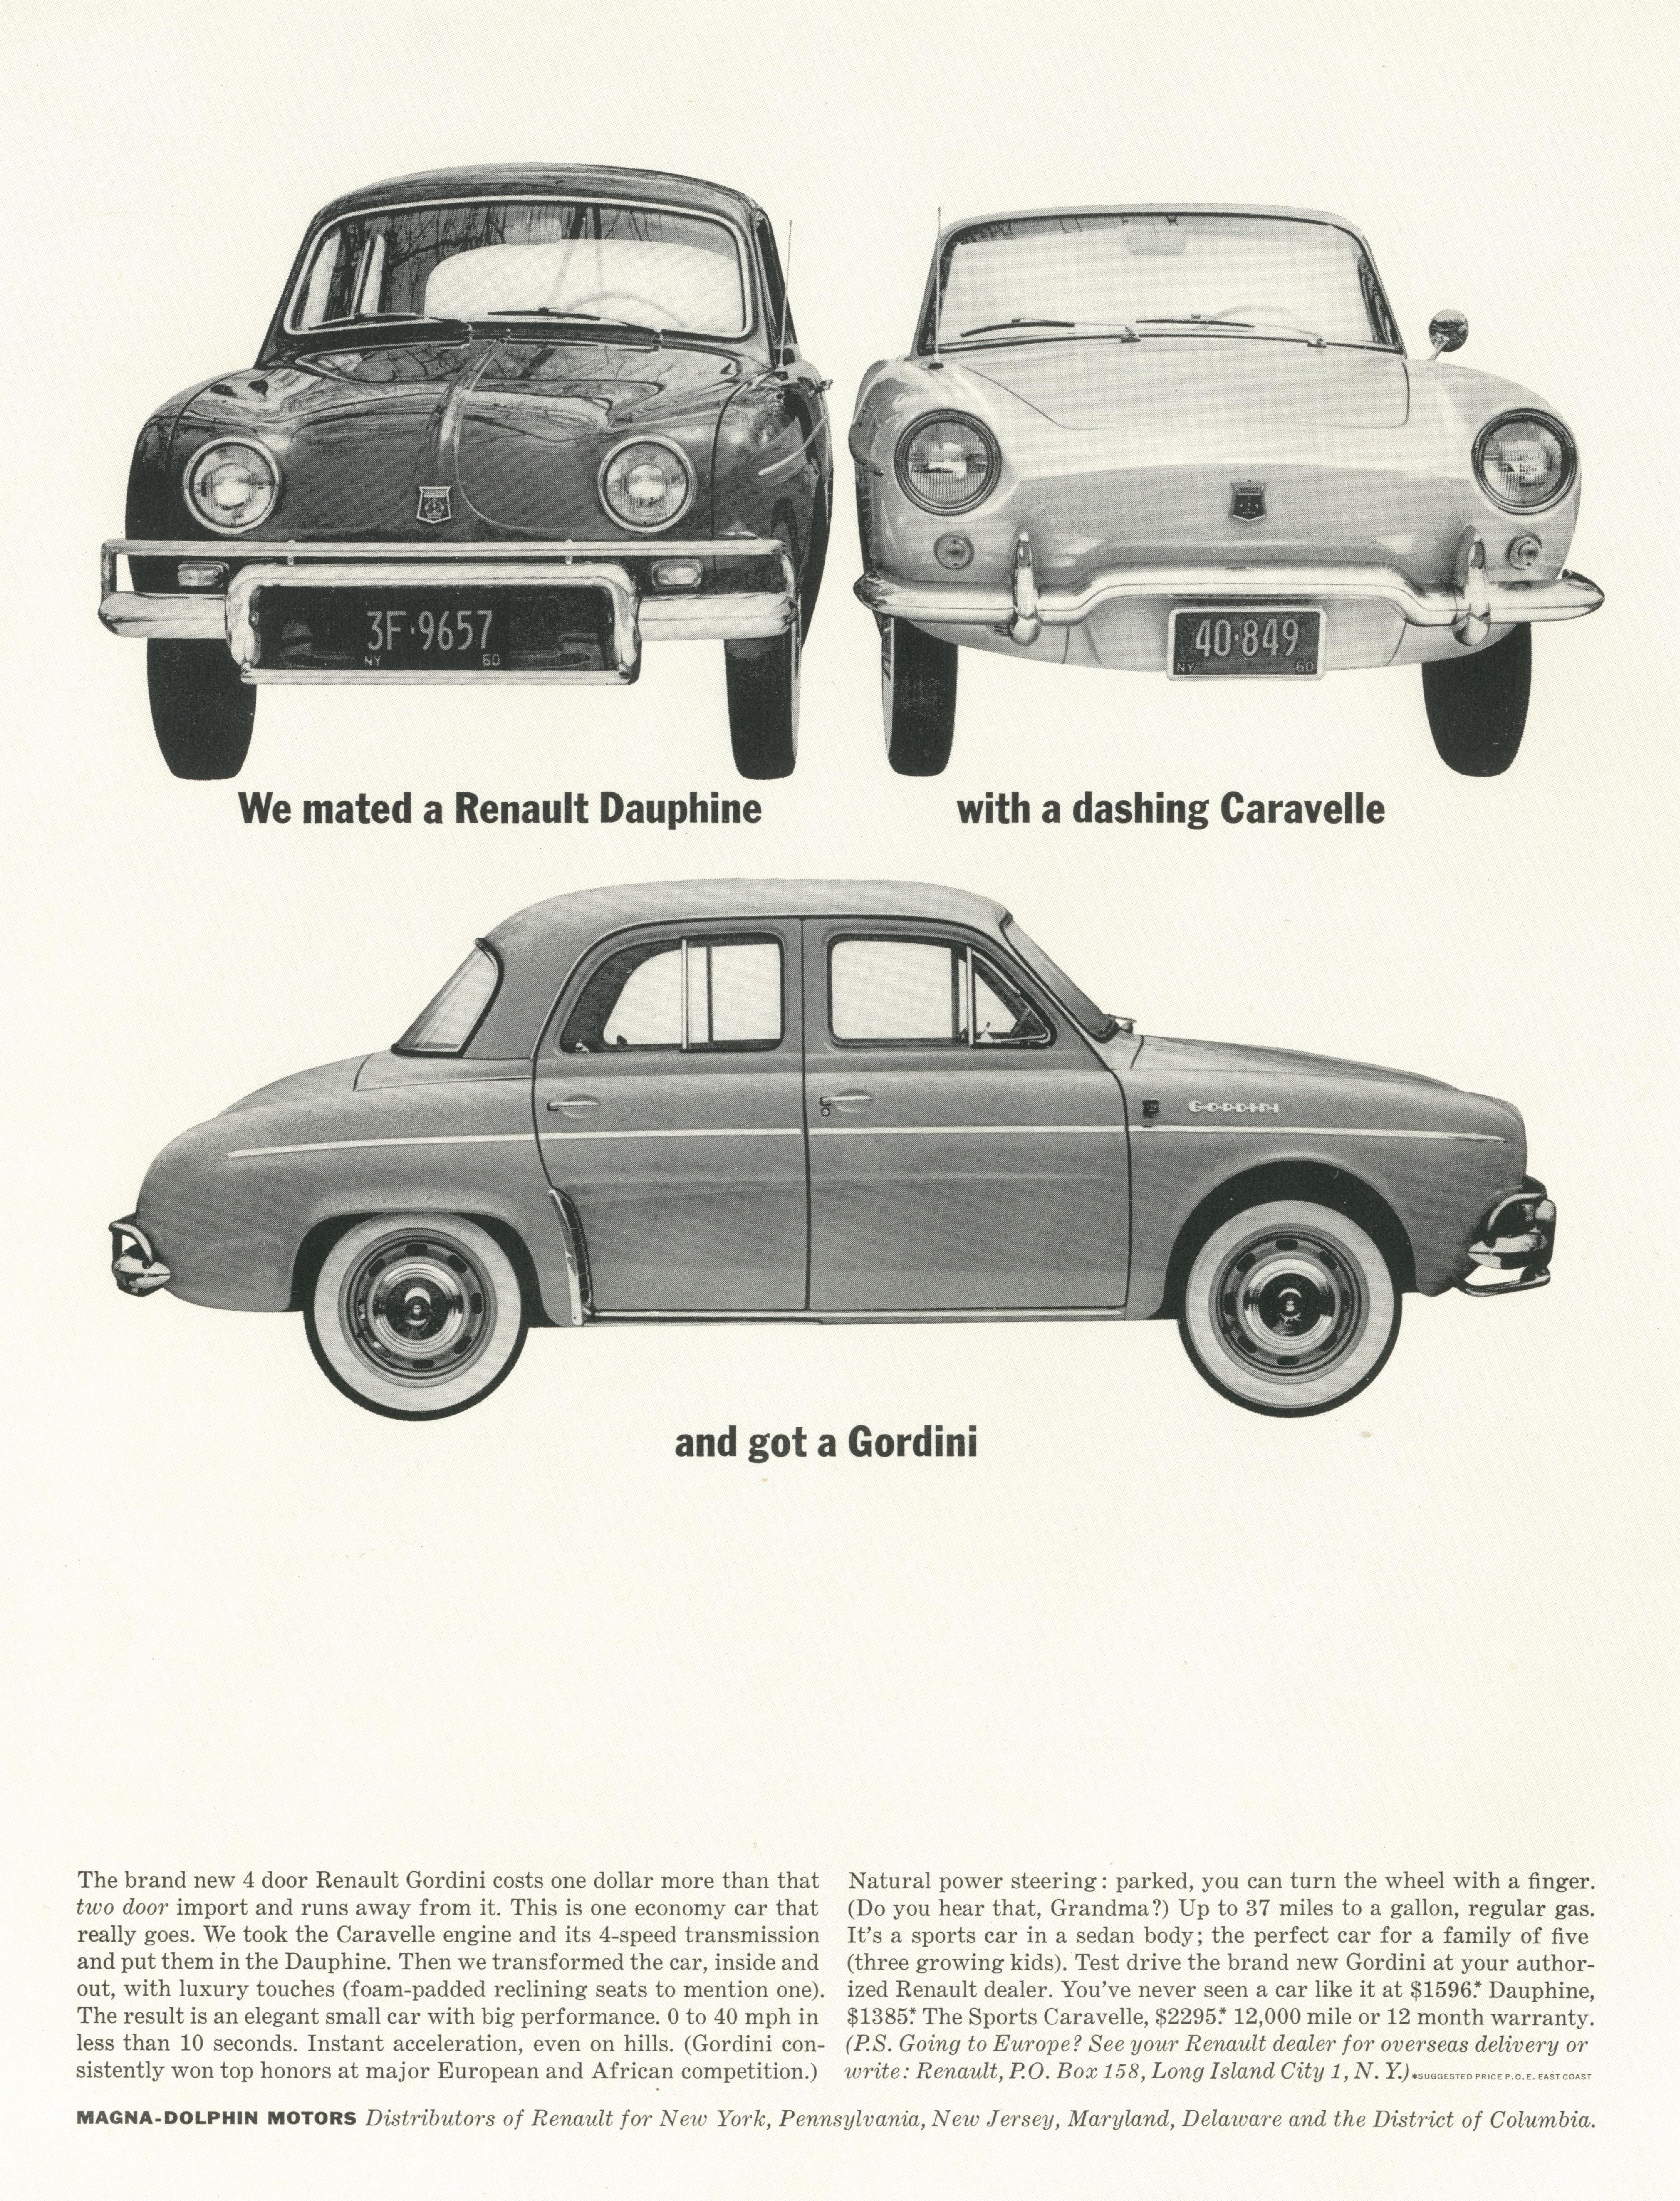 PKL2; Renault 'Mated'-01